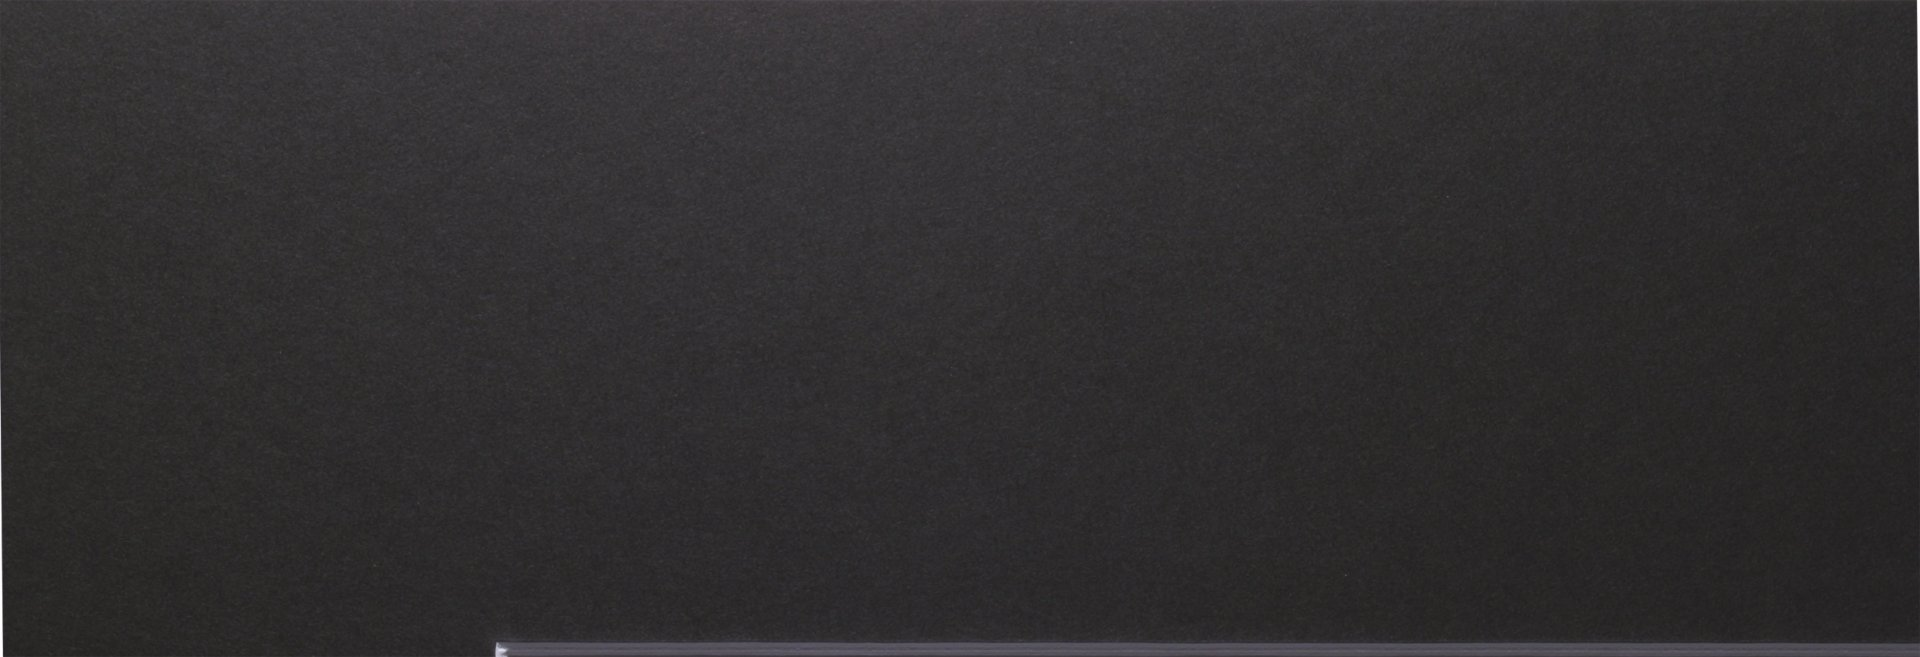 GSRM 921 Smooth Black